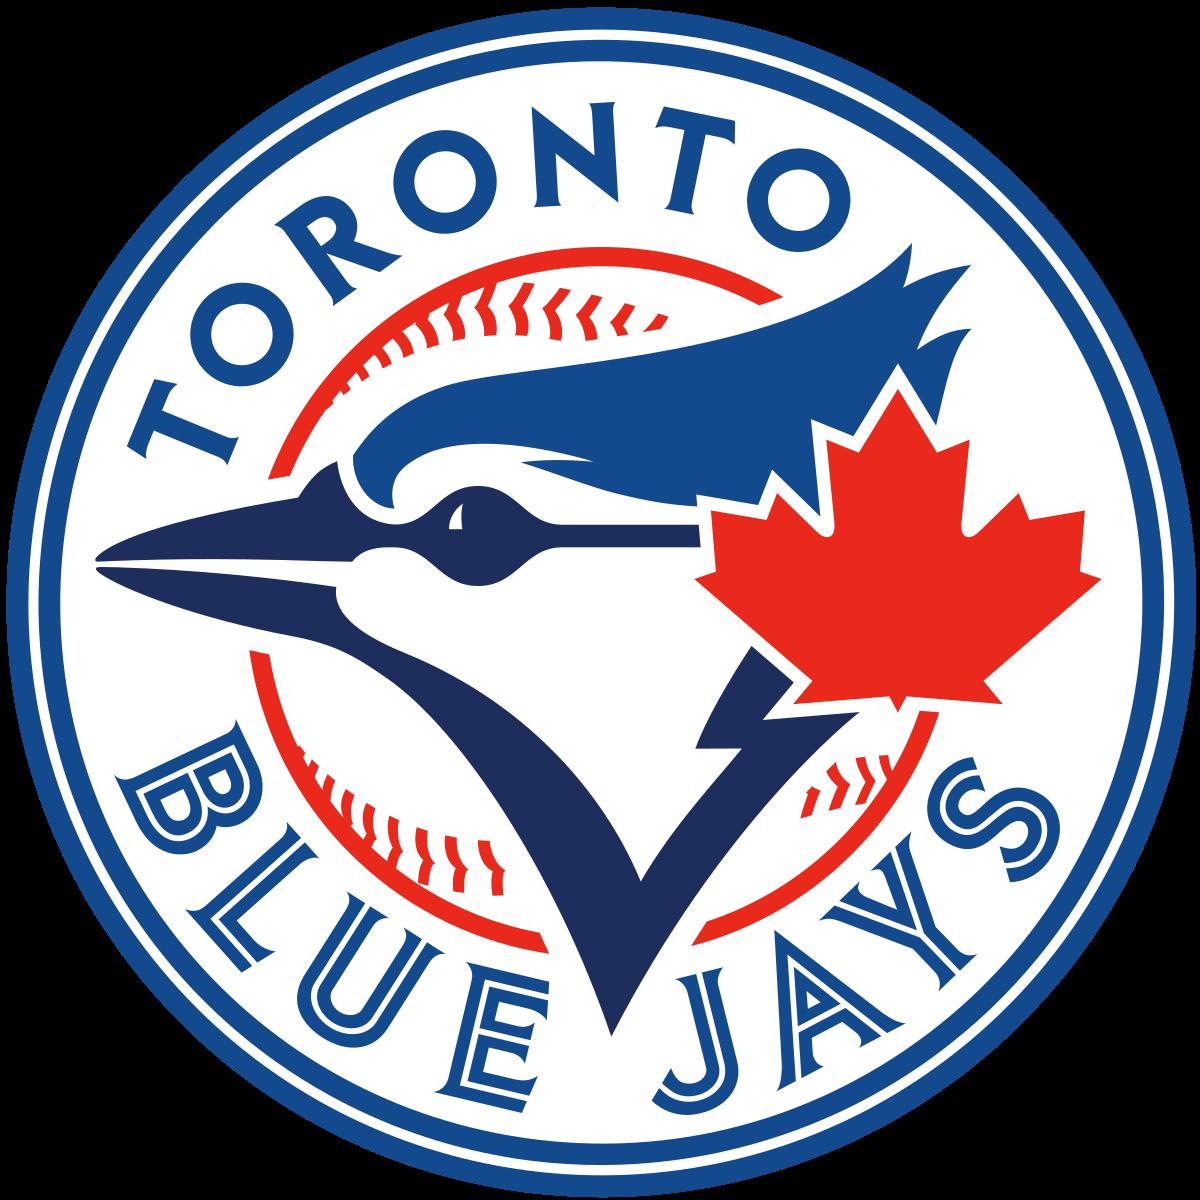 Toronto Blue Jays Logo Png Image Toronto Blue Jays Logo Blue Jays Baseball Toronto Blue Jays Baseball